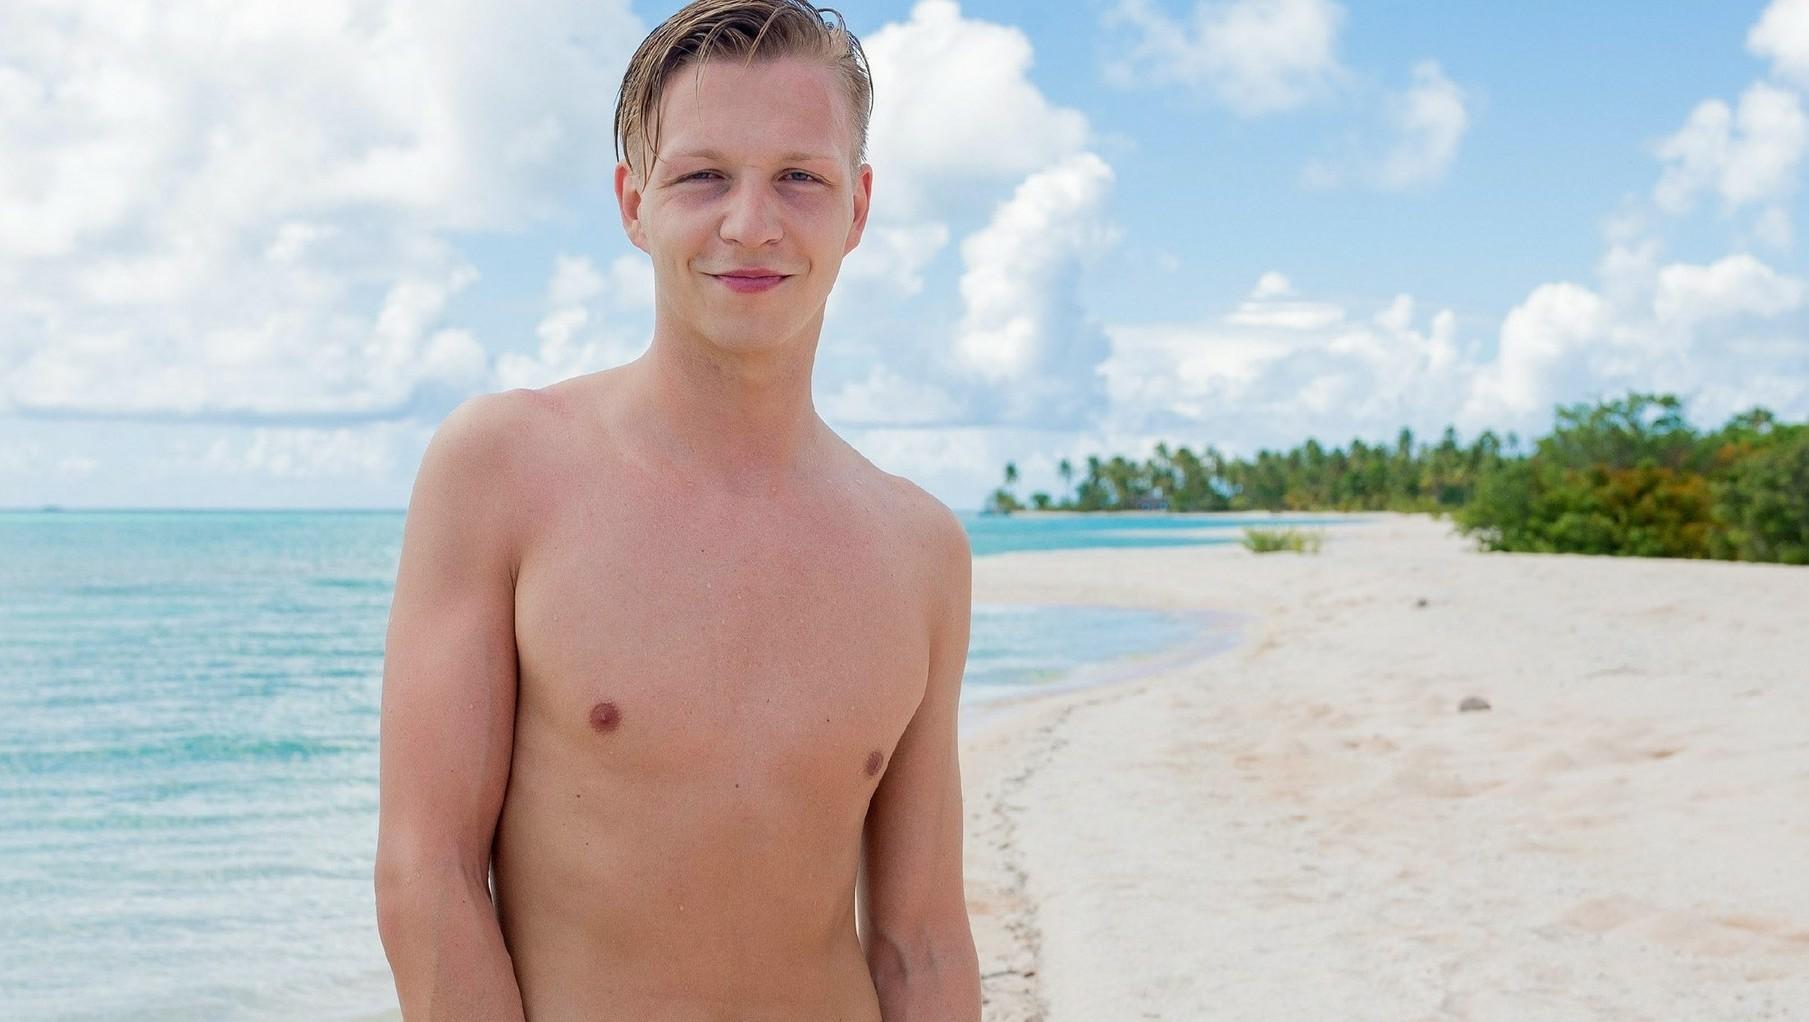 Torpedo Achi Verlor Wegen Nackt Dating Show Job Krone At